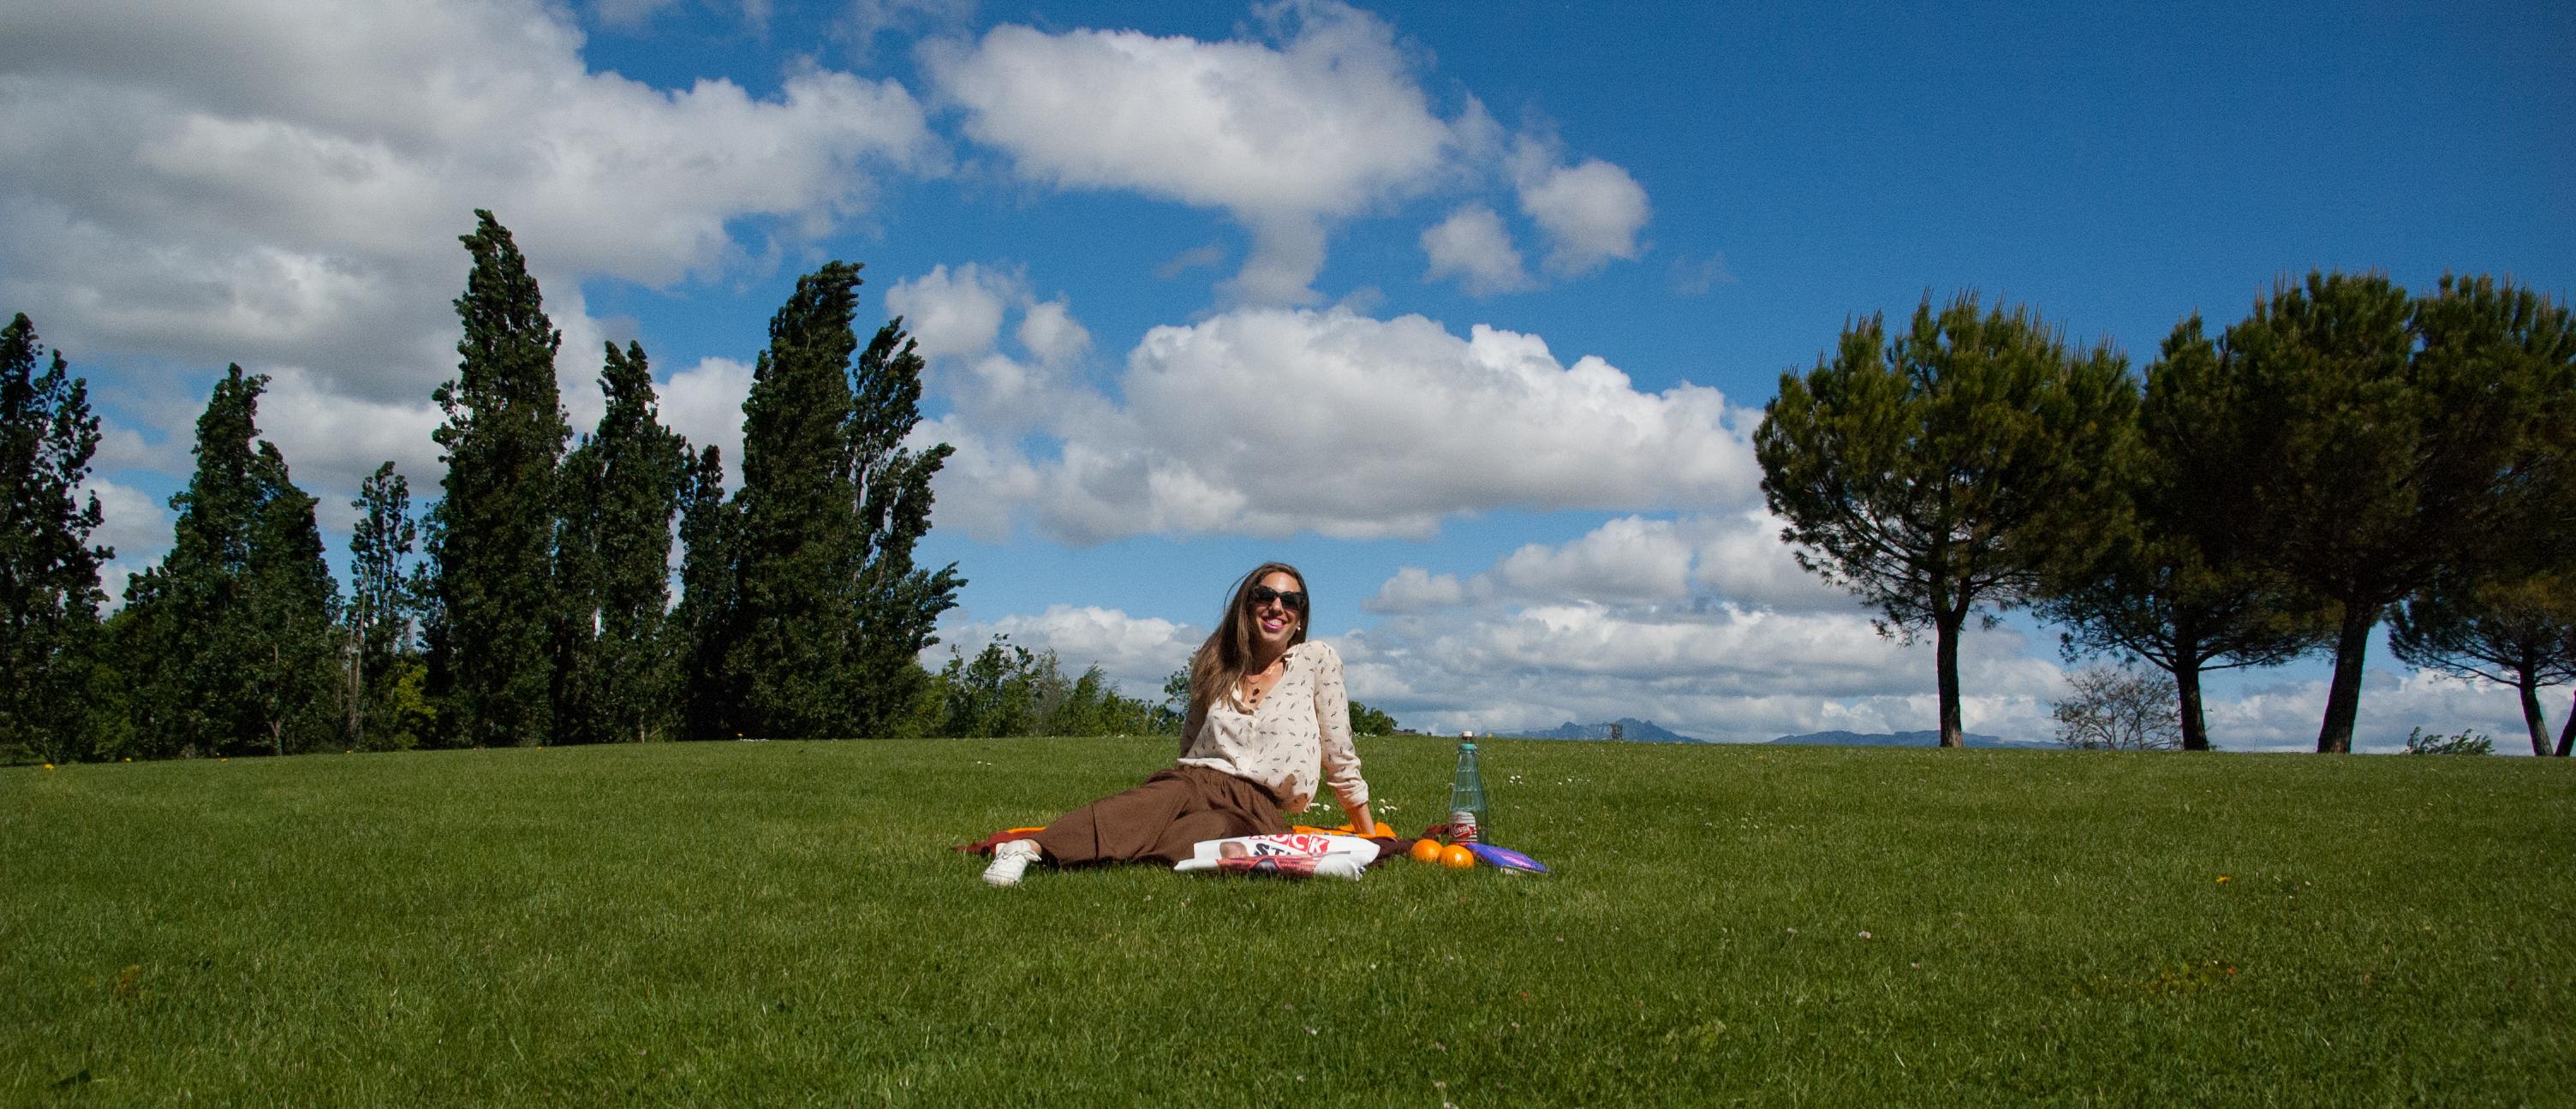 picnic-10